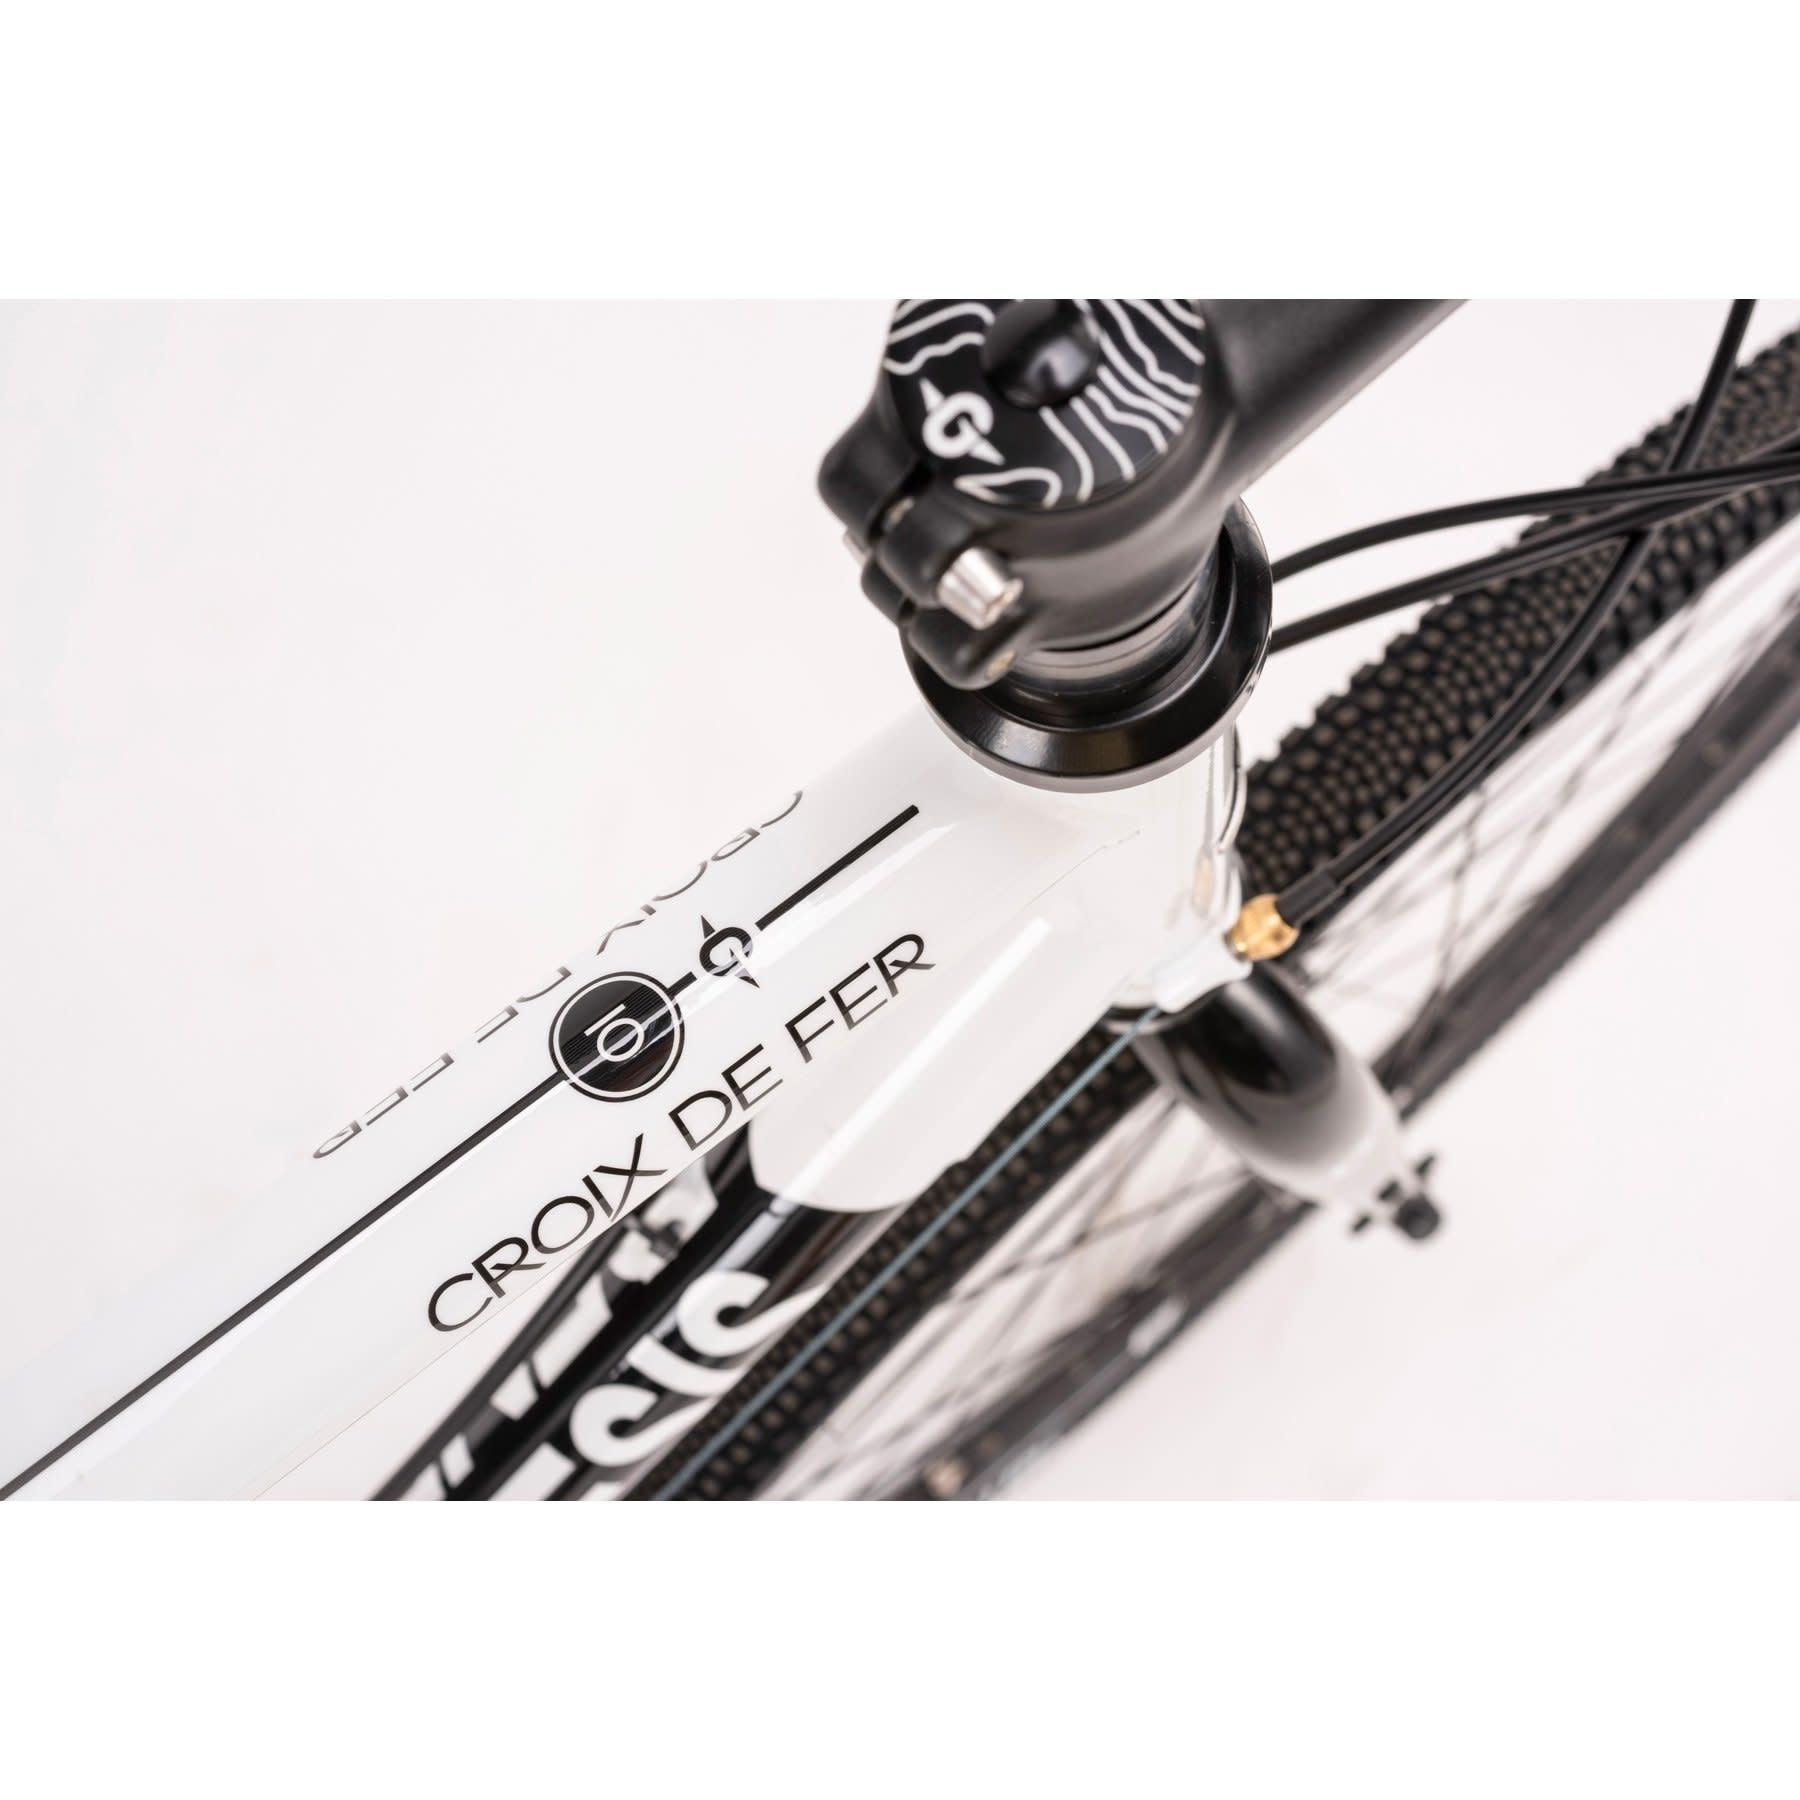 Genesis Genesis Croix de Fer 10 Drop Bar White/Black 2020